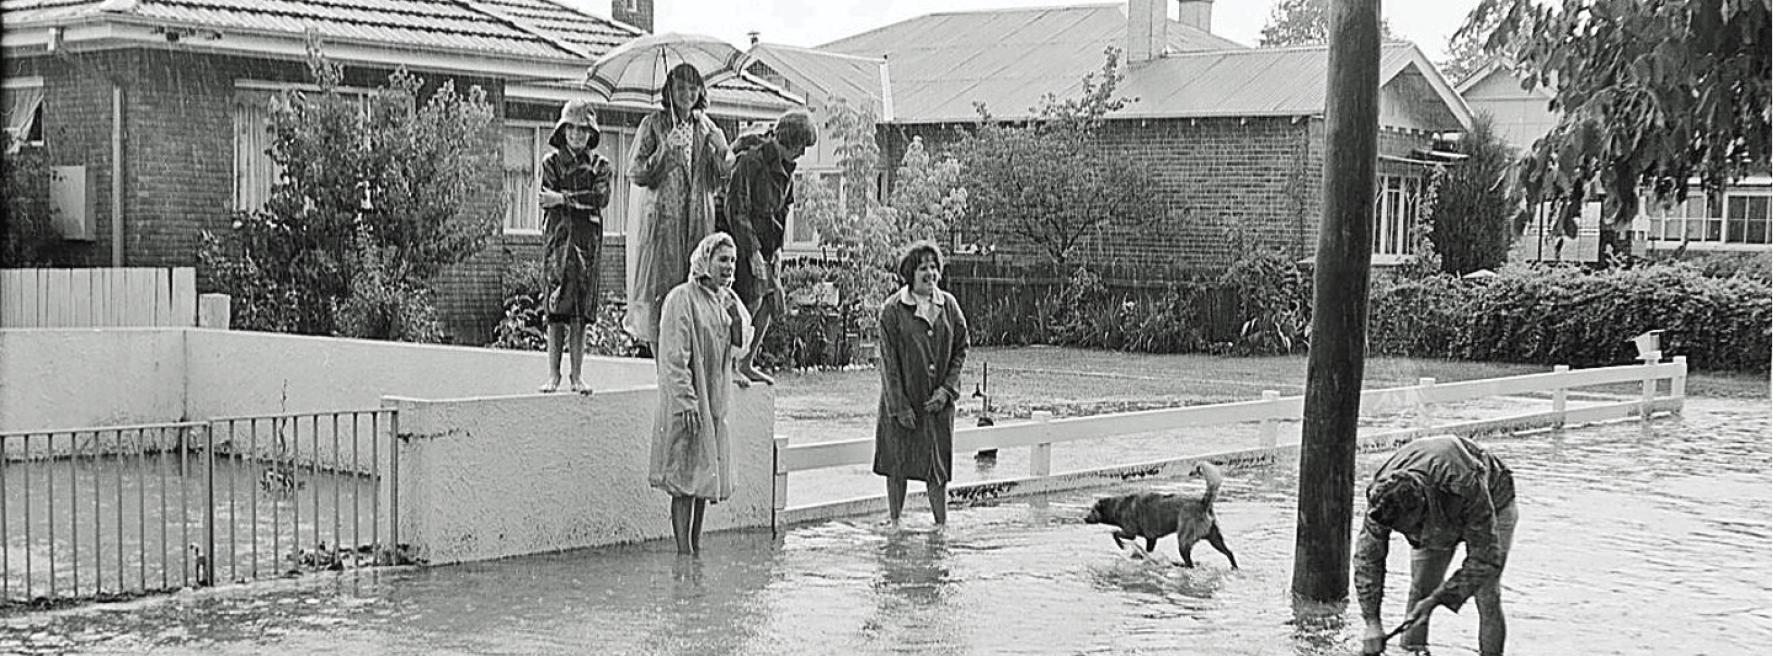 Flooding in Kite Street in 1966